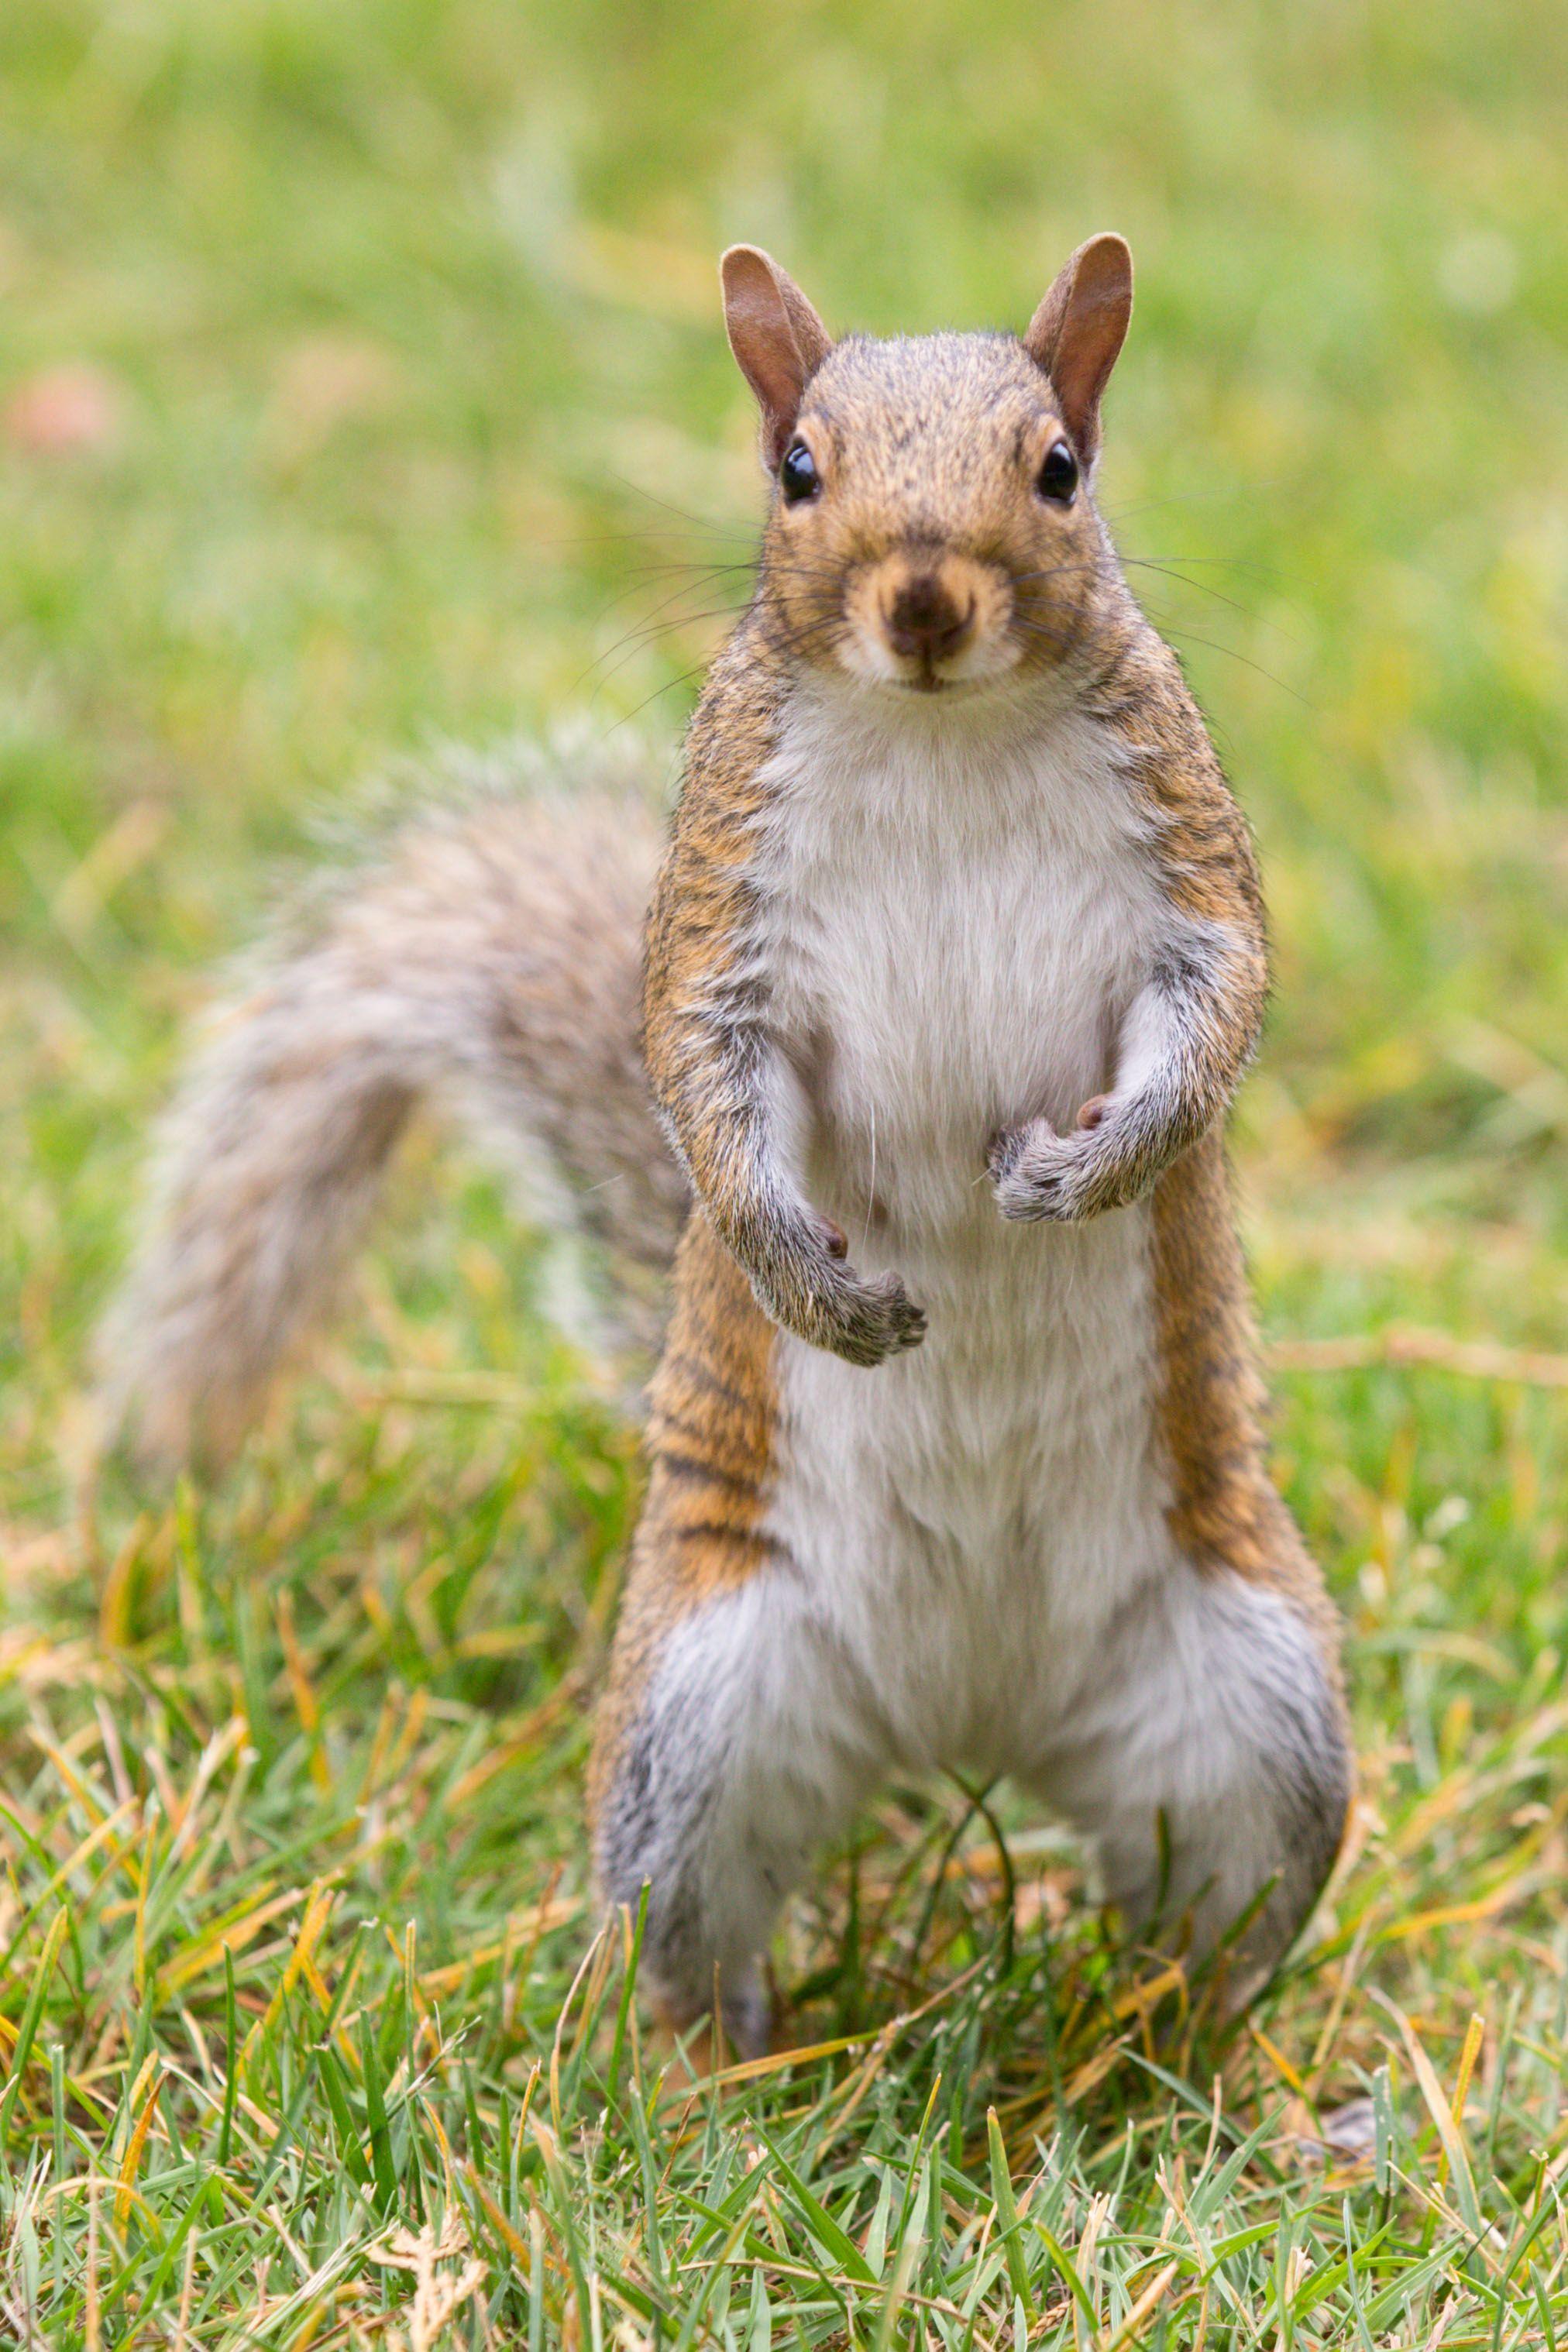 squirrel animals Pinterest Squirrel and Animal